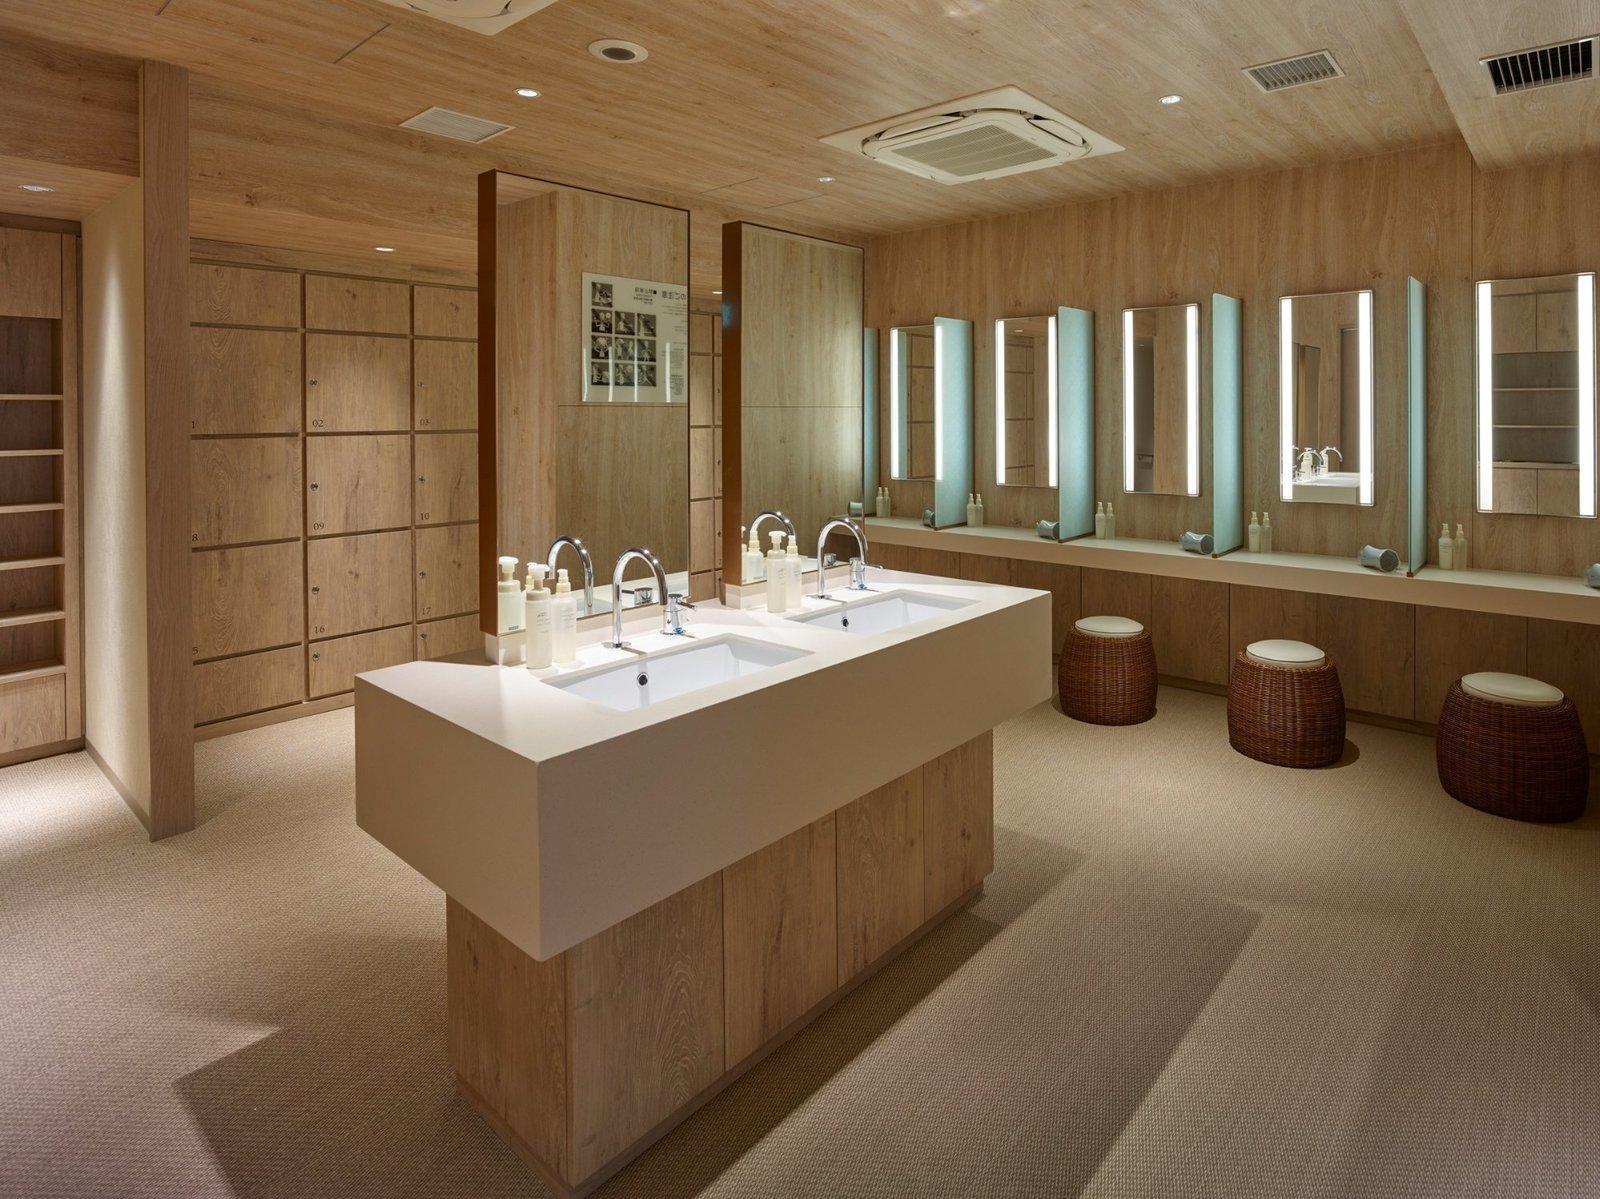 Bath Room, Carpet Floor, Recessed Lighting, and Undermount Sink  Hotel The Celestine Kyoto Gion